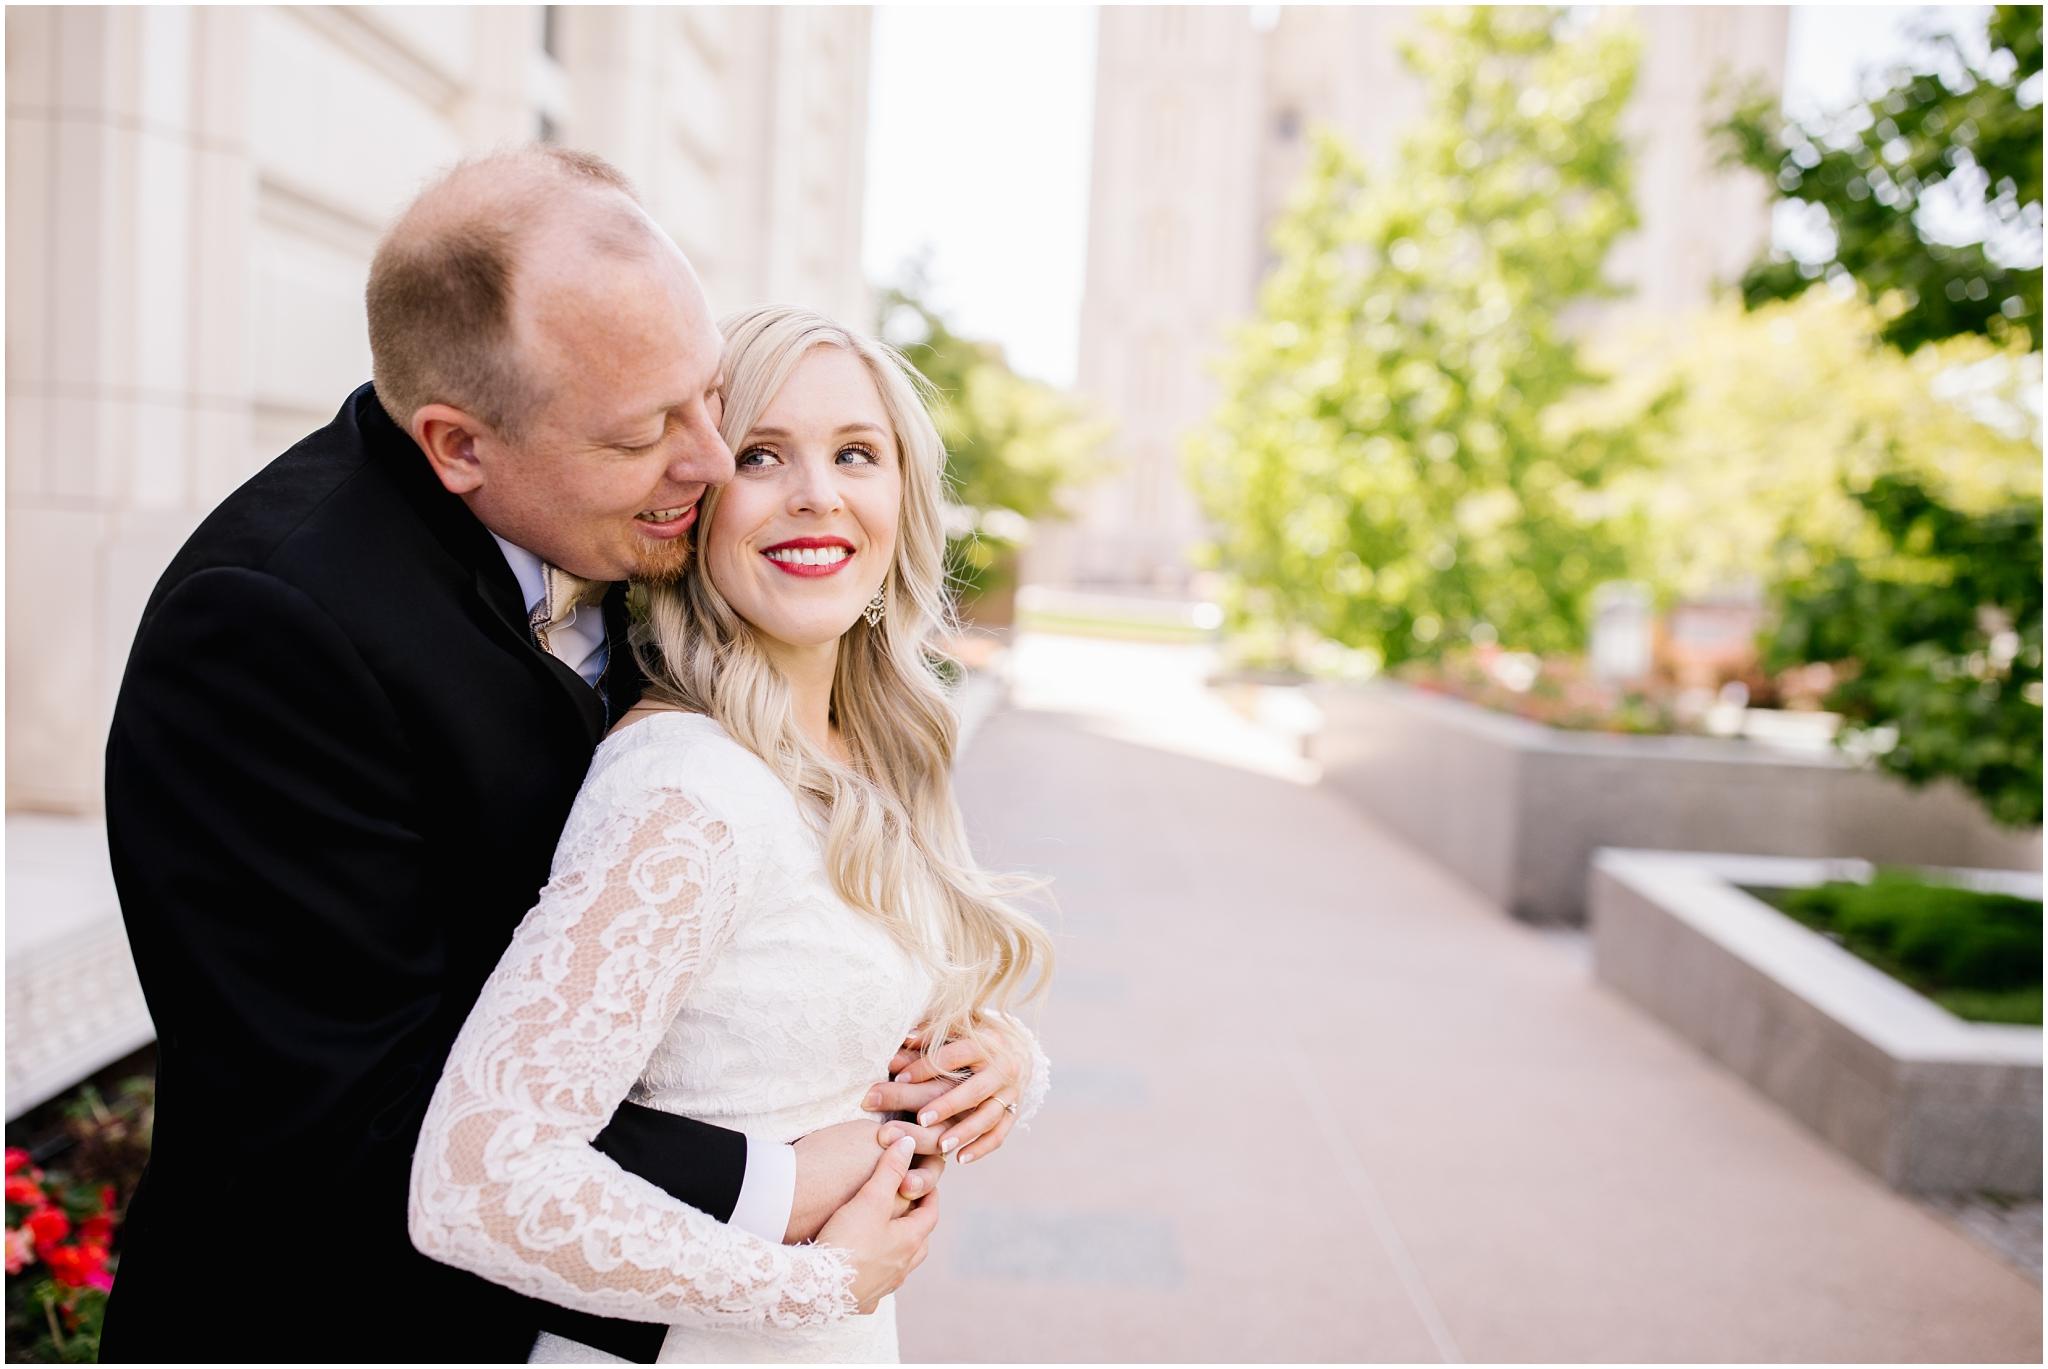 CherylandTyler-286_Lizzie-B-Imagery-Utah-Wedding-Photographer-Salt-Lake-City-Temple-Wells-Fargo-Building-Reception.jpg